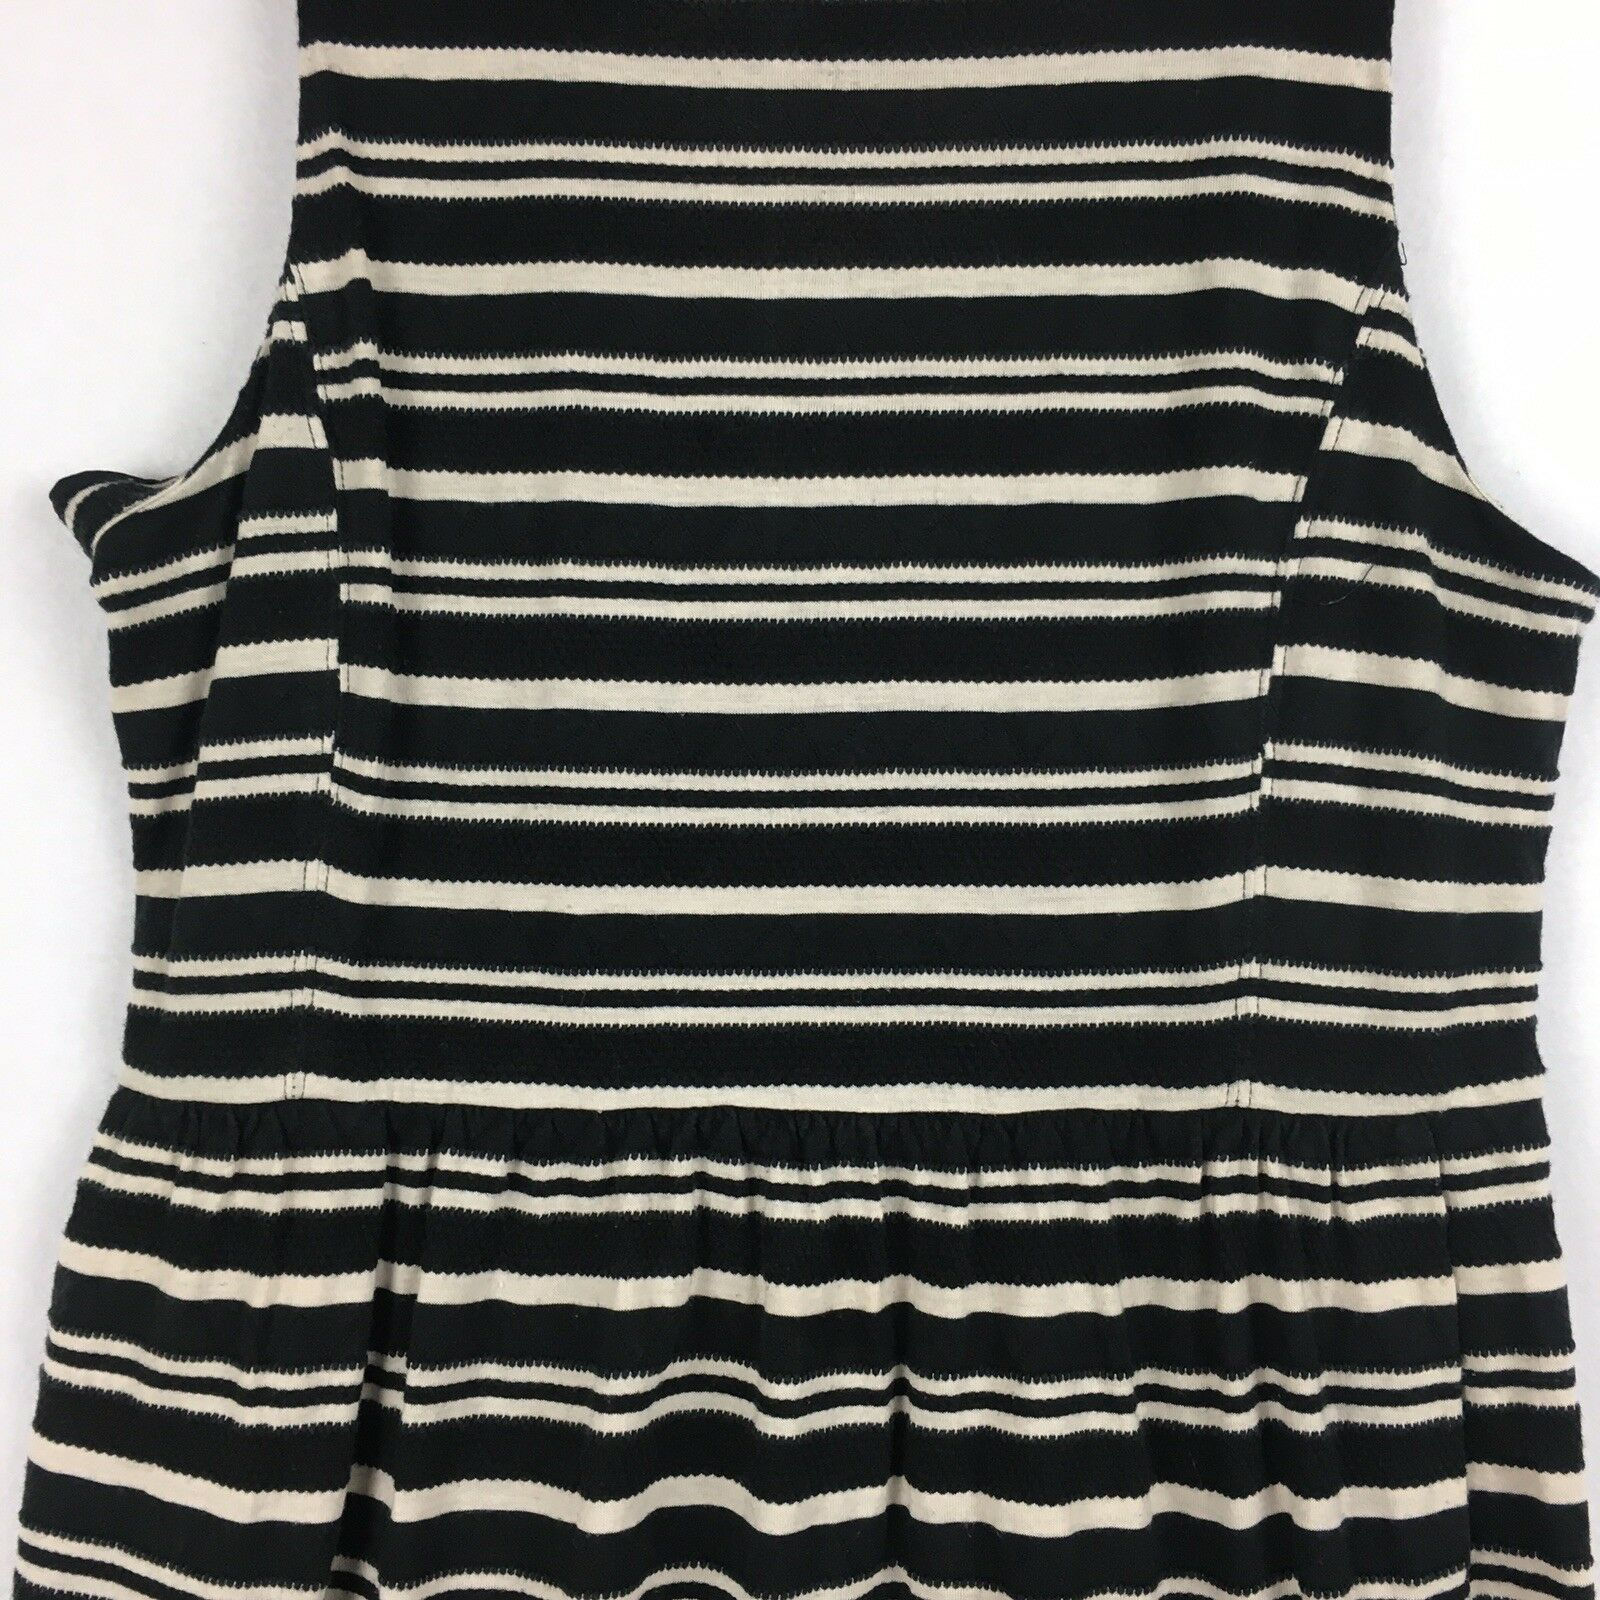 J.Crew Factory Sleeveless Scoopneck Black & Beige Striped Midi Dress Size XL  image 2